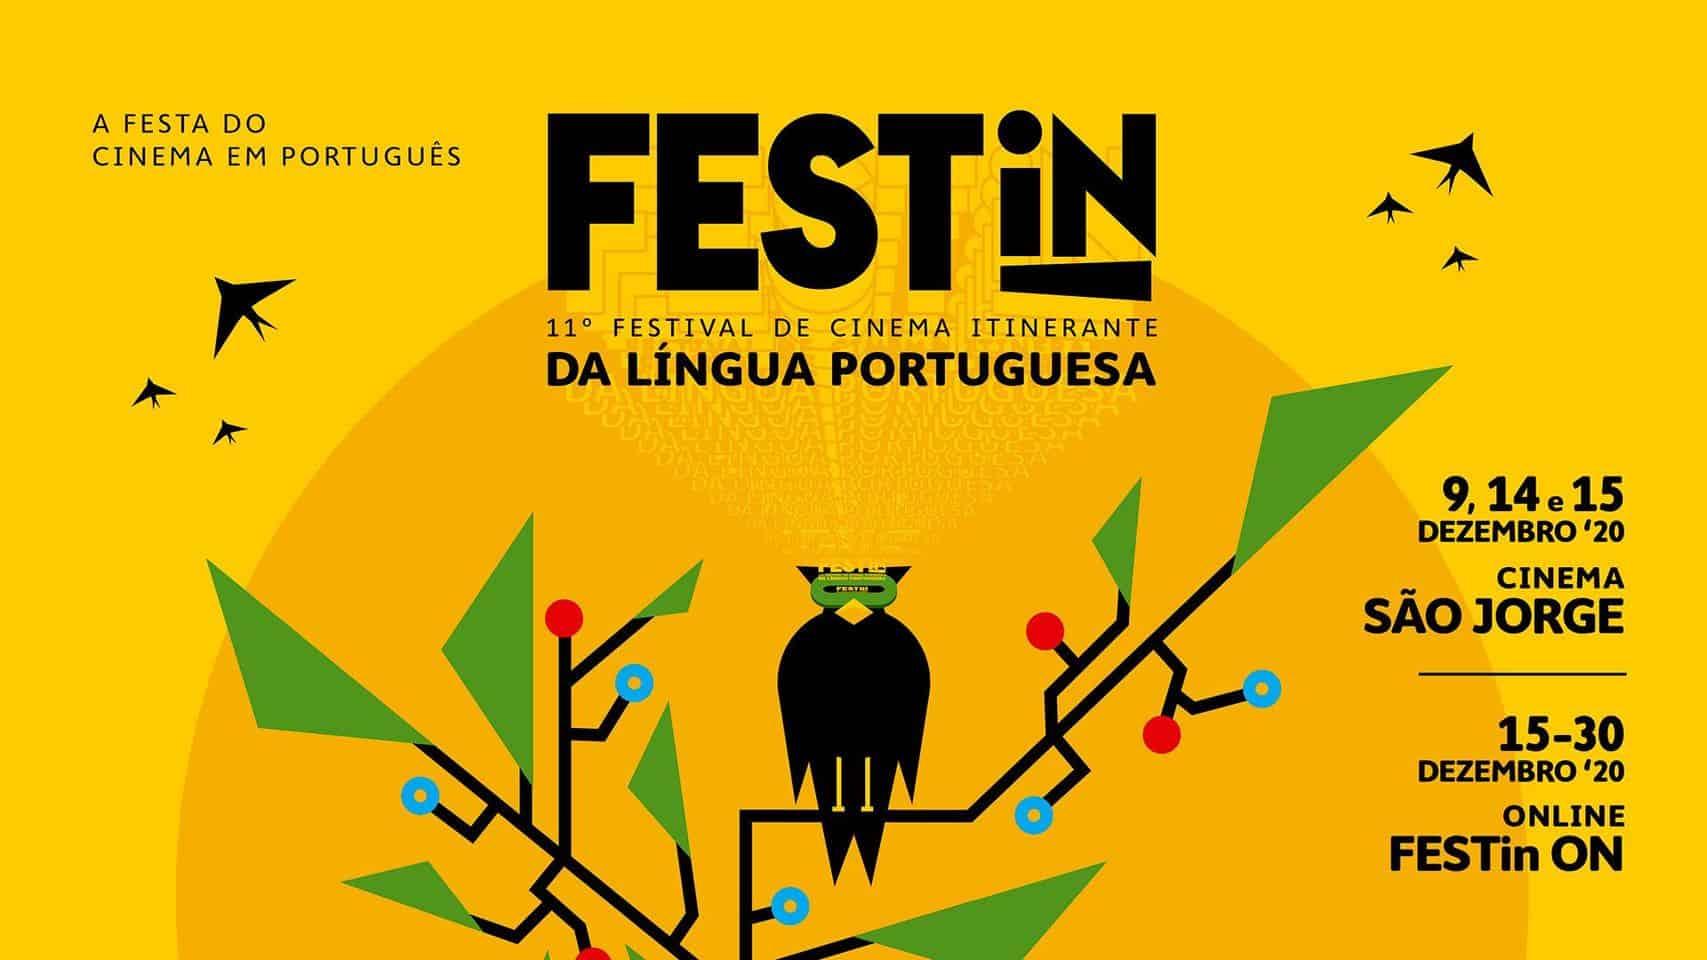 11º Festival de Cinema Itinerante da Língua Portuguesa Artes & contextos festin da lingua portuguesa